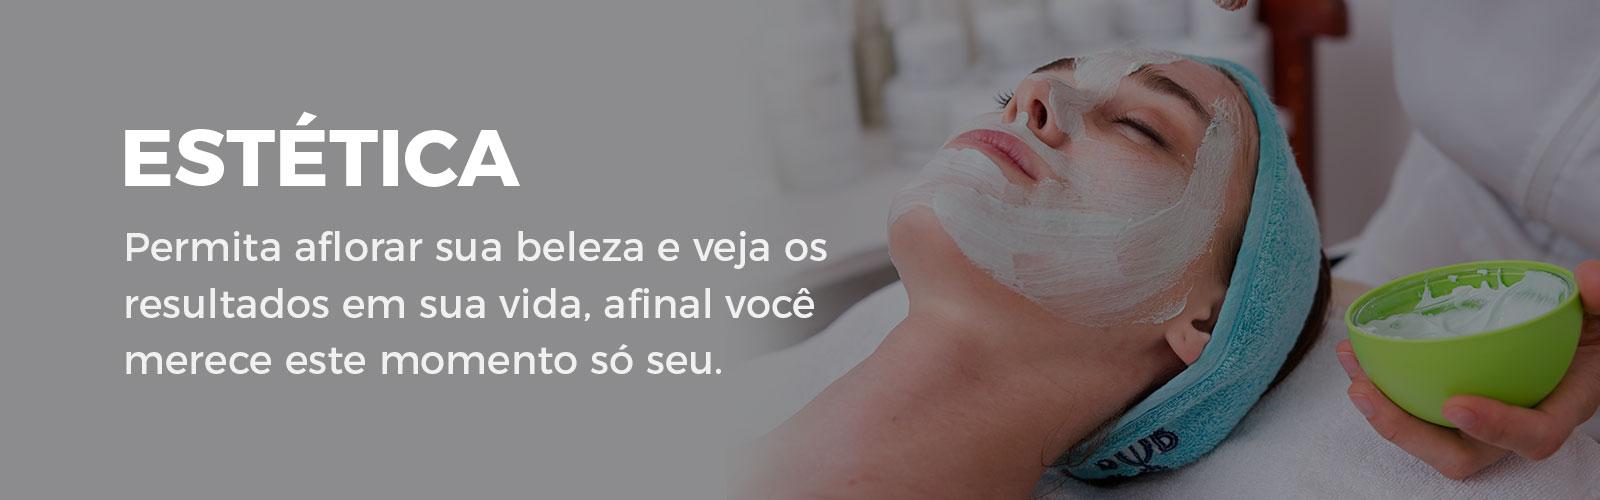 https://belaclin.com.br/estetica